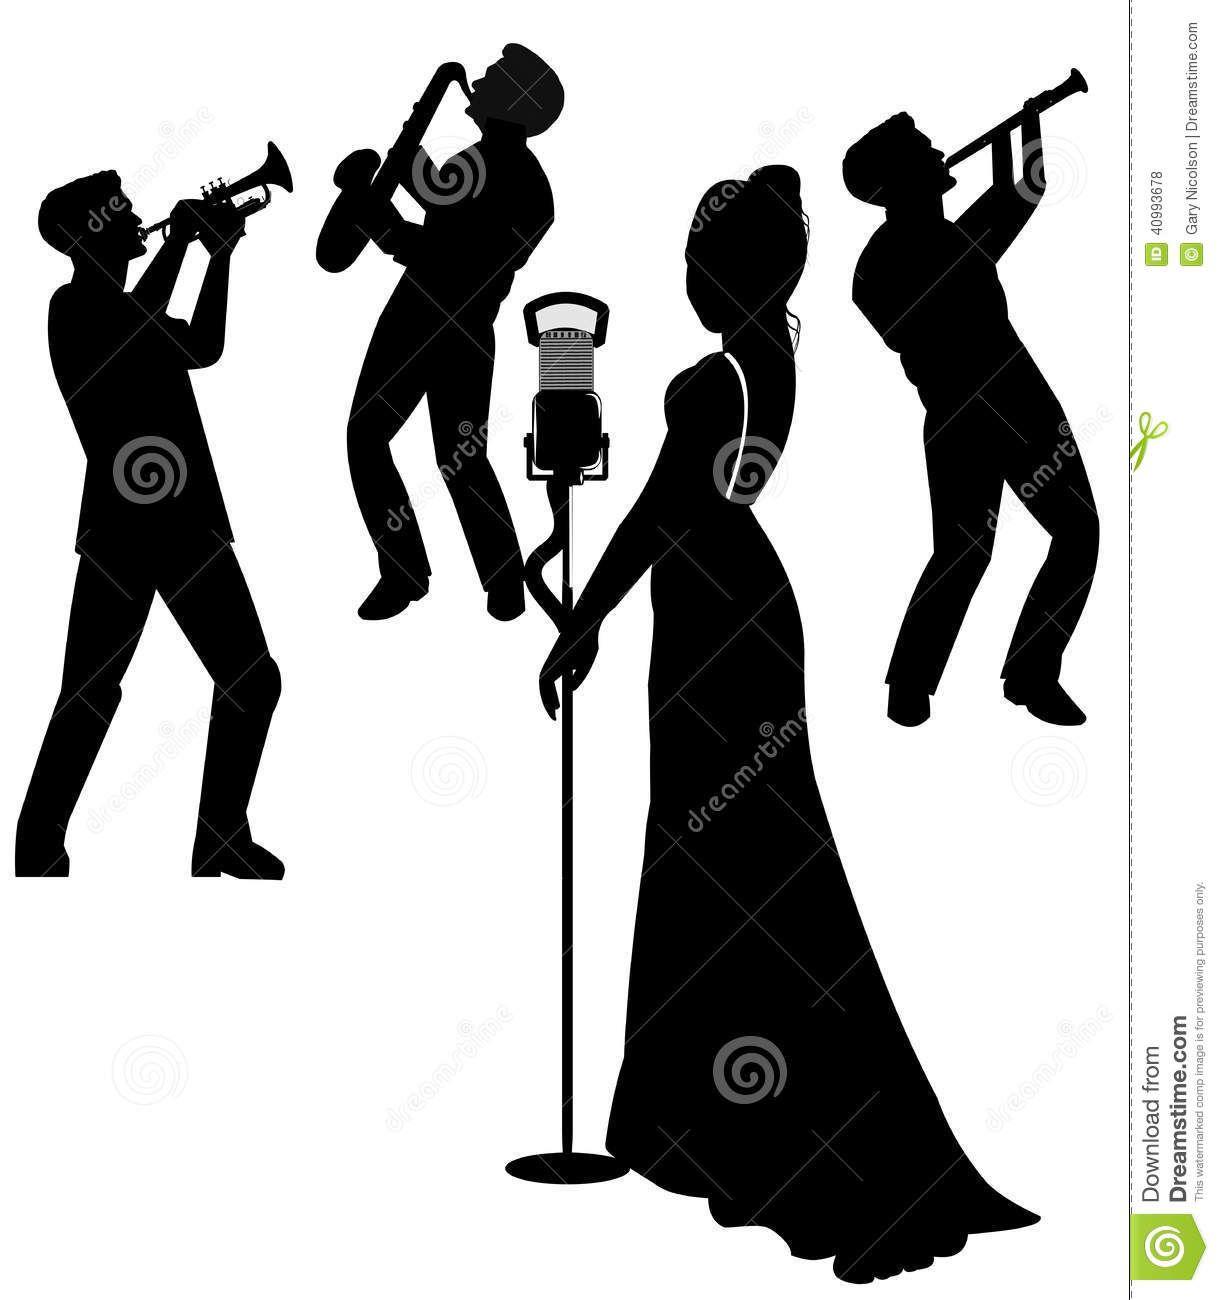 Images for jazz singer. Artist clipart silhouette